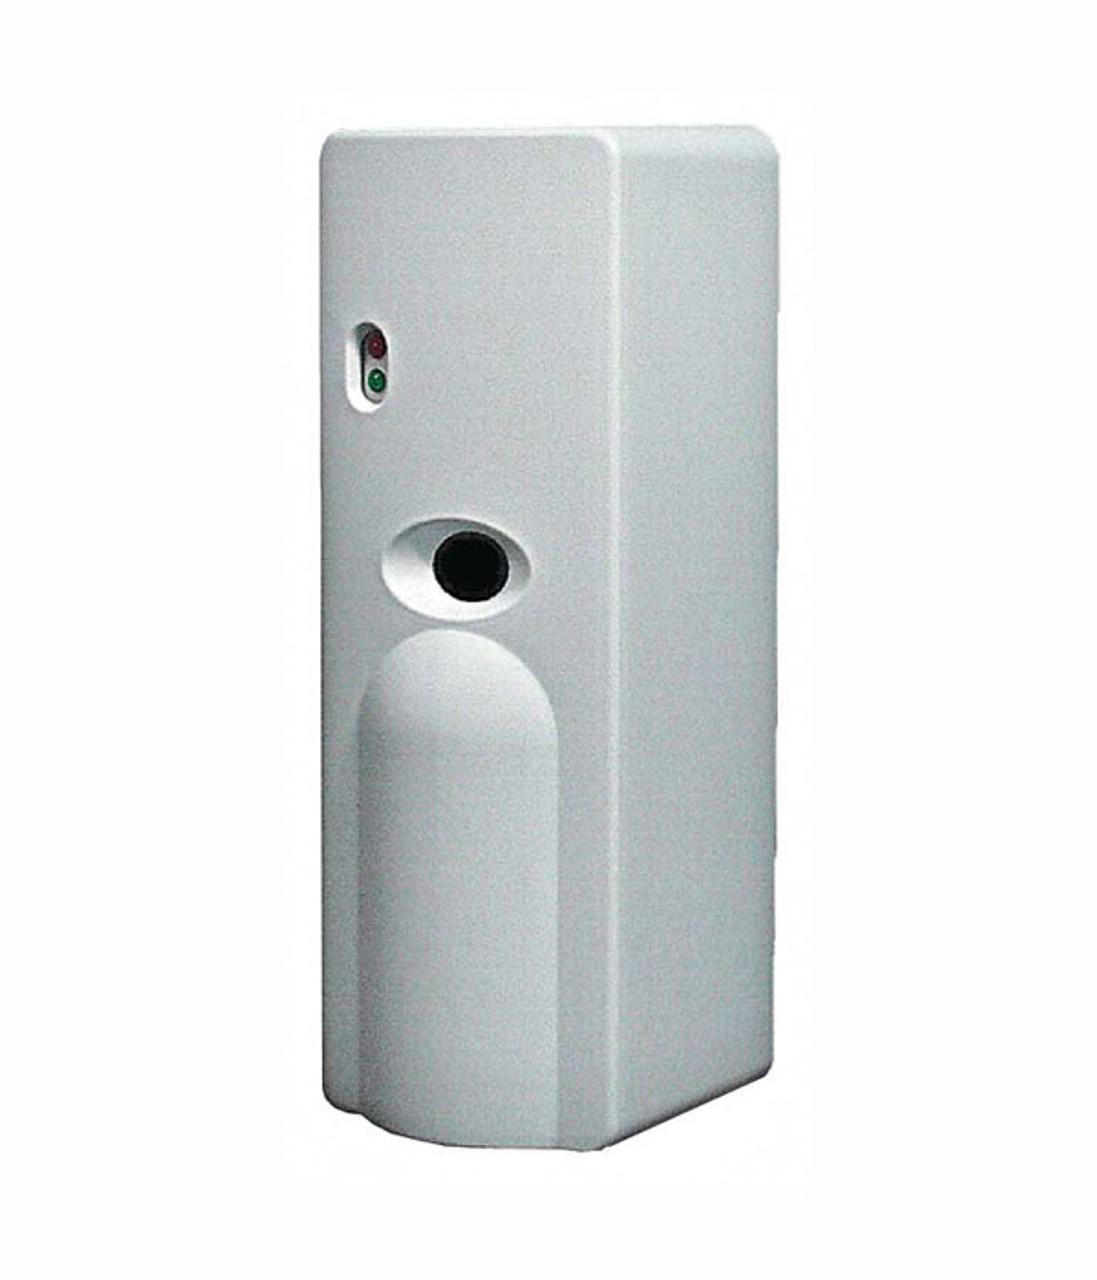 Sprayon Spray Scents 1000 Metered Air Freshener Dispenser automatically sprays at intervals of 15 minutes.